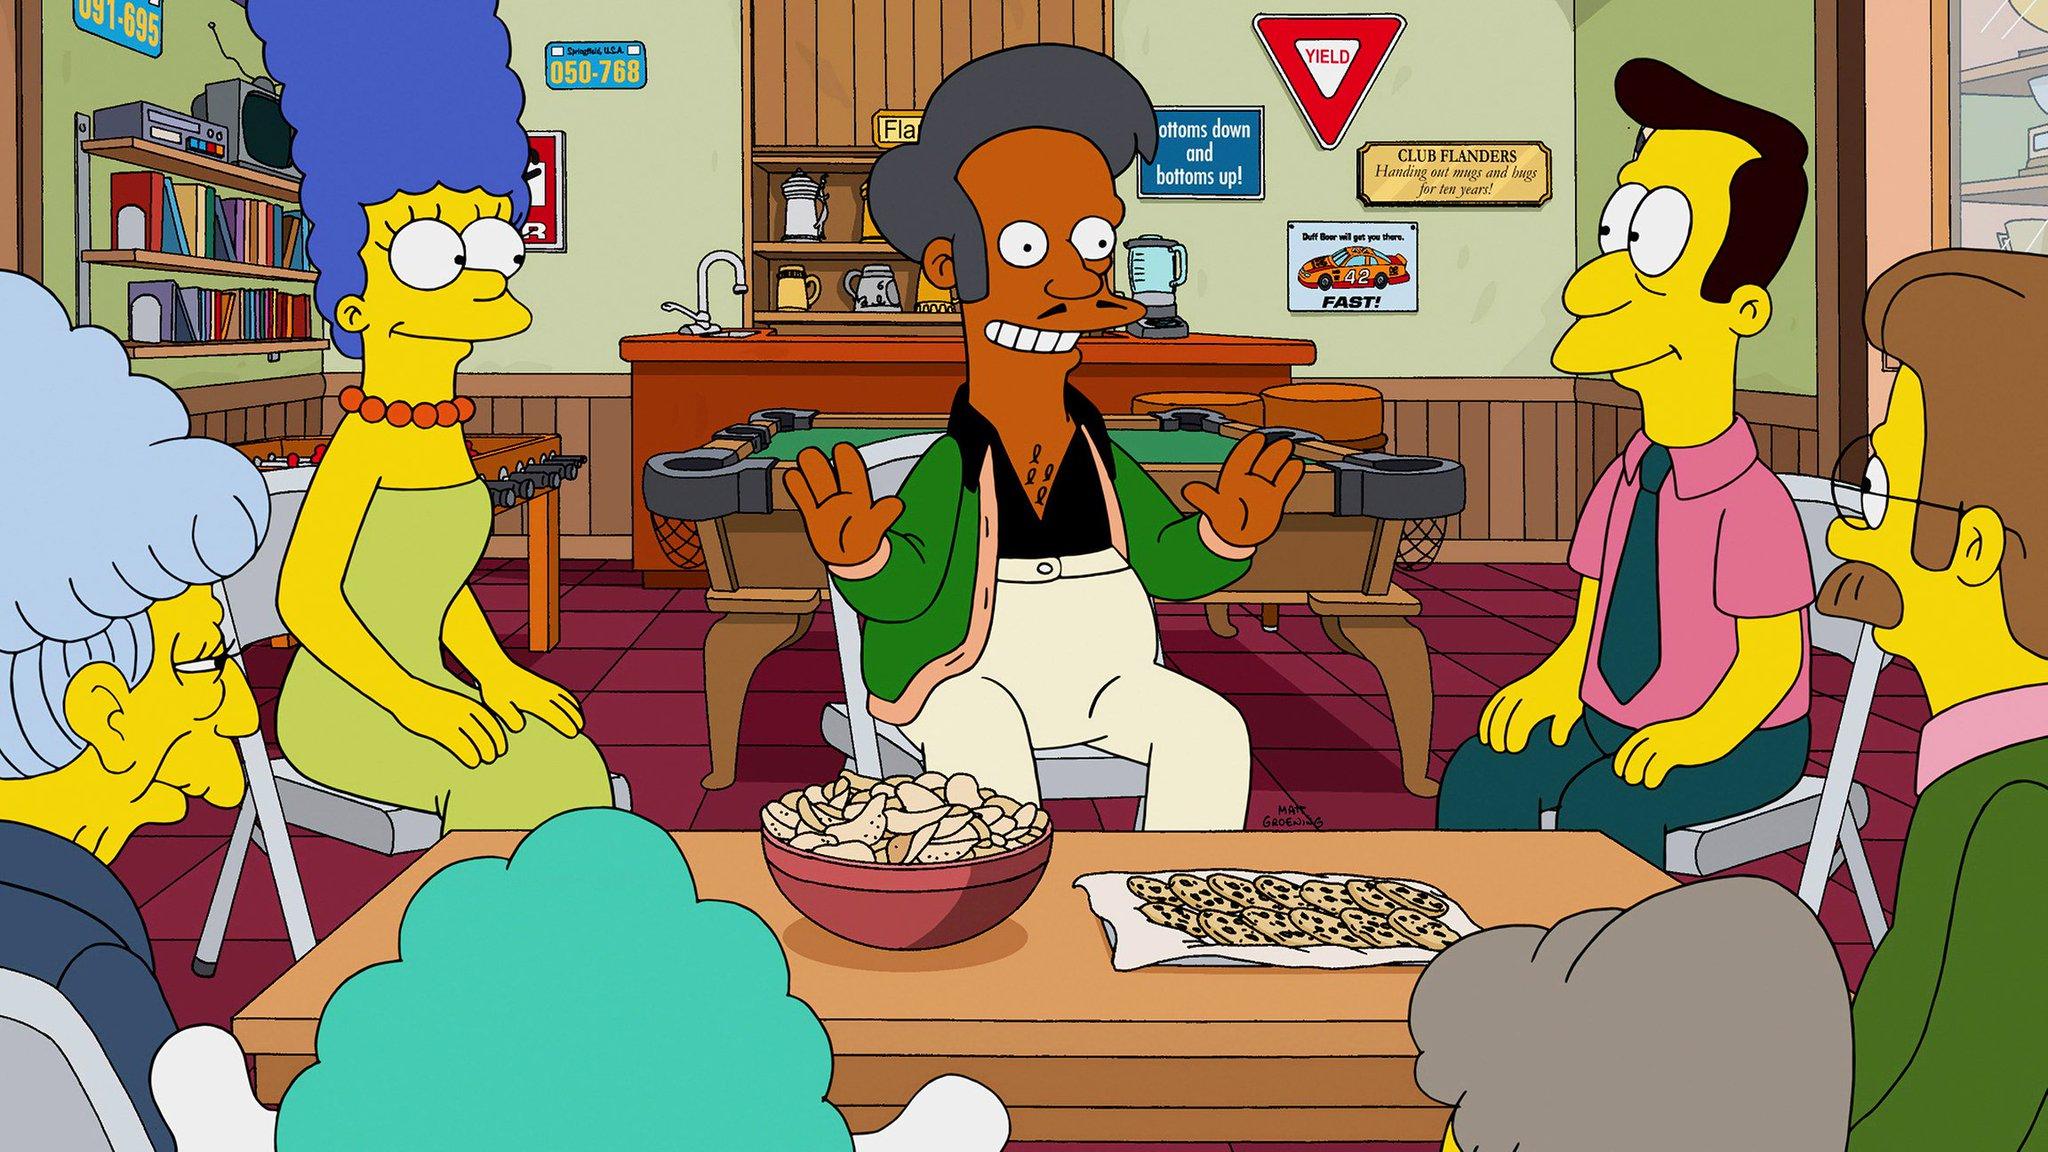 Hari Kondabolu's 'The Problem with Apu' confronts 'The Simpsons' glaring blindspot https://t.co/ySKrMaEAR8 https://t.co/rAjyrjzYzV